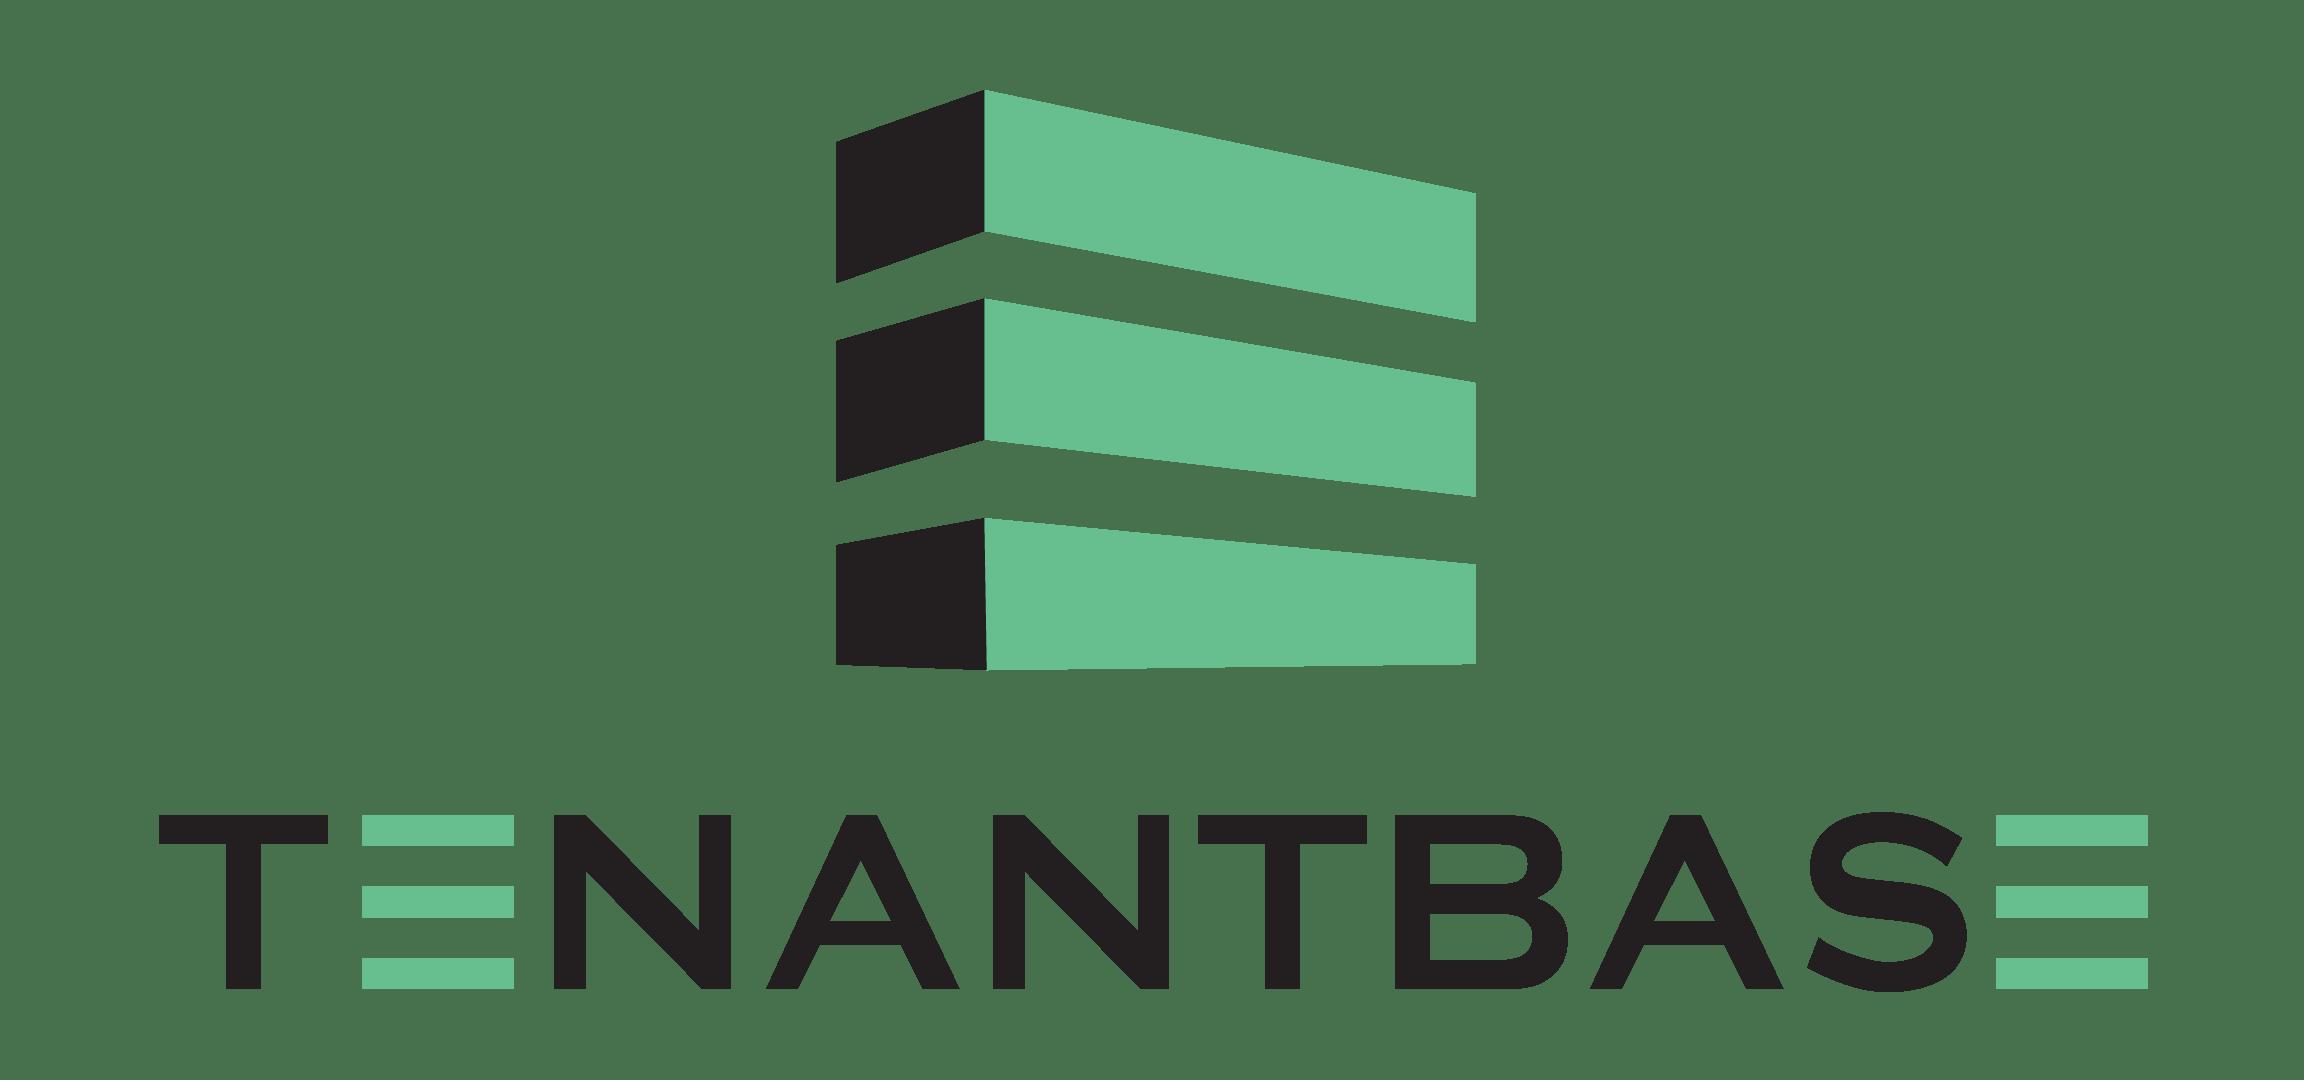 TenantBase company logo